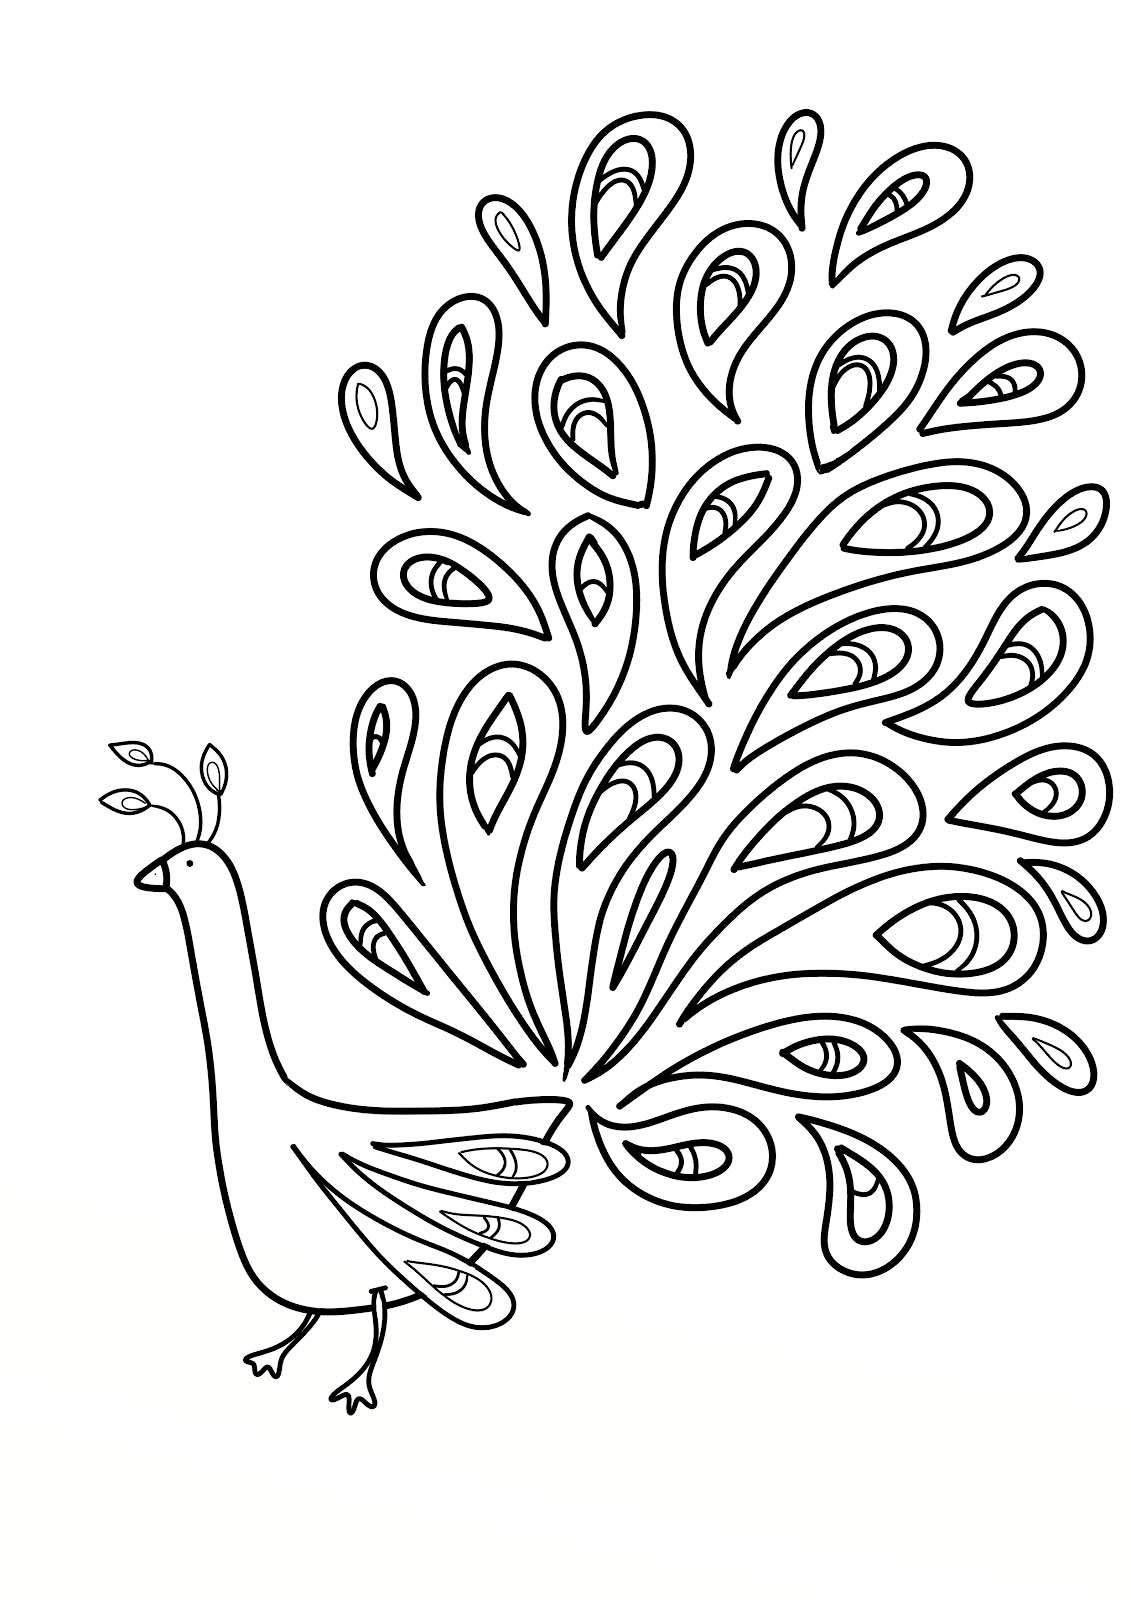 Gambar Mewarnai Burung Merak 3